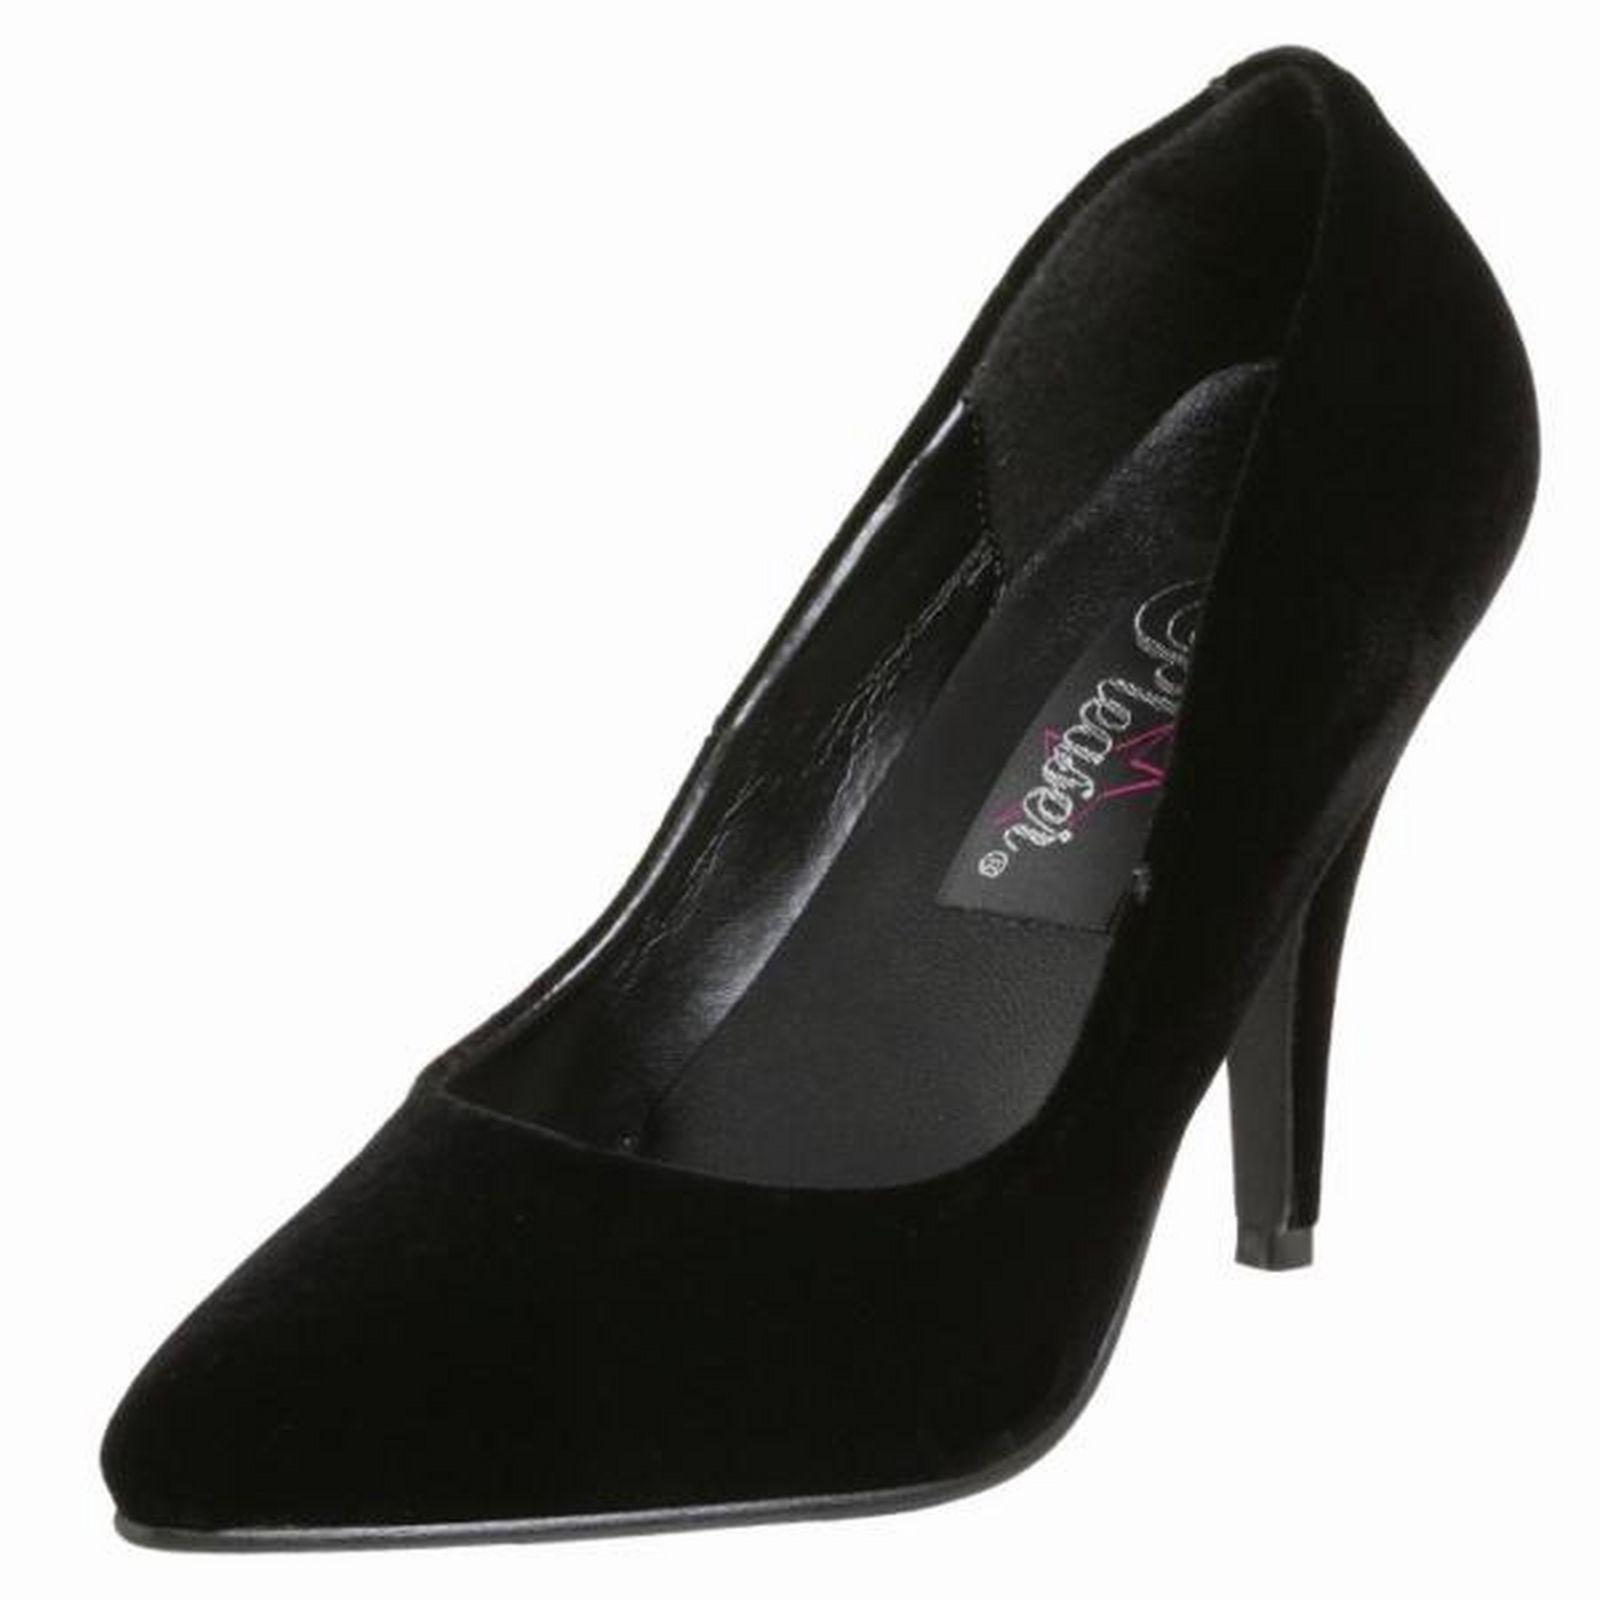 schwarz Velvet Velvet schwarz High Heel Pointed Toe Vanity Classic Pumps Damenschuhe baf664